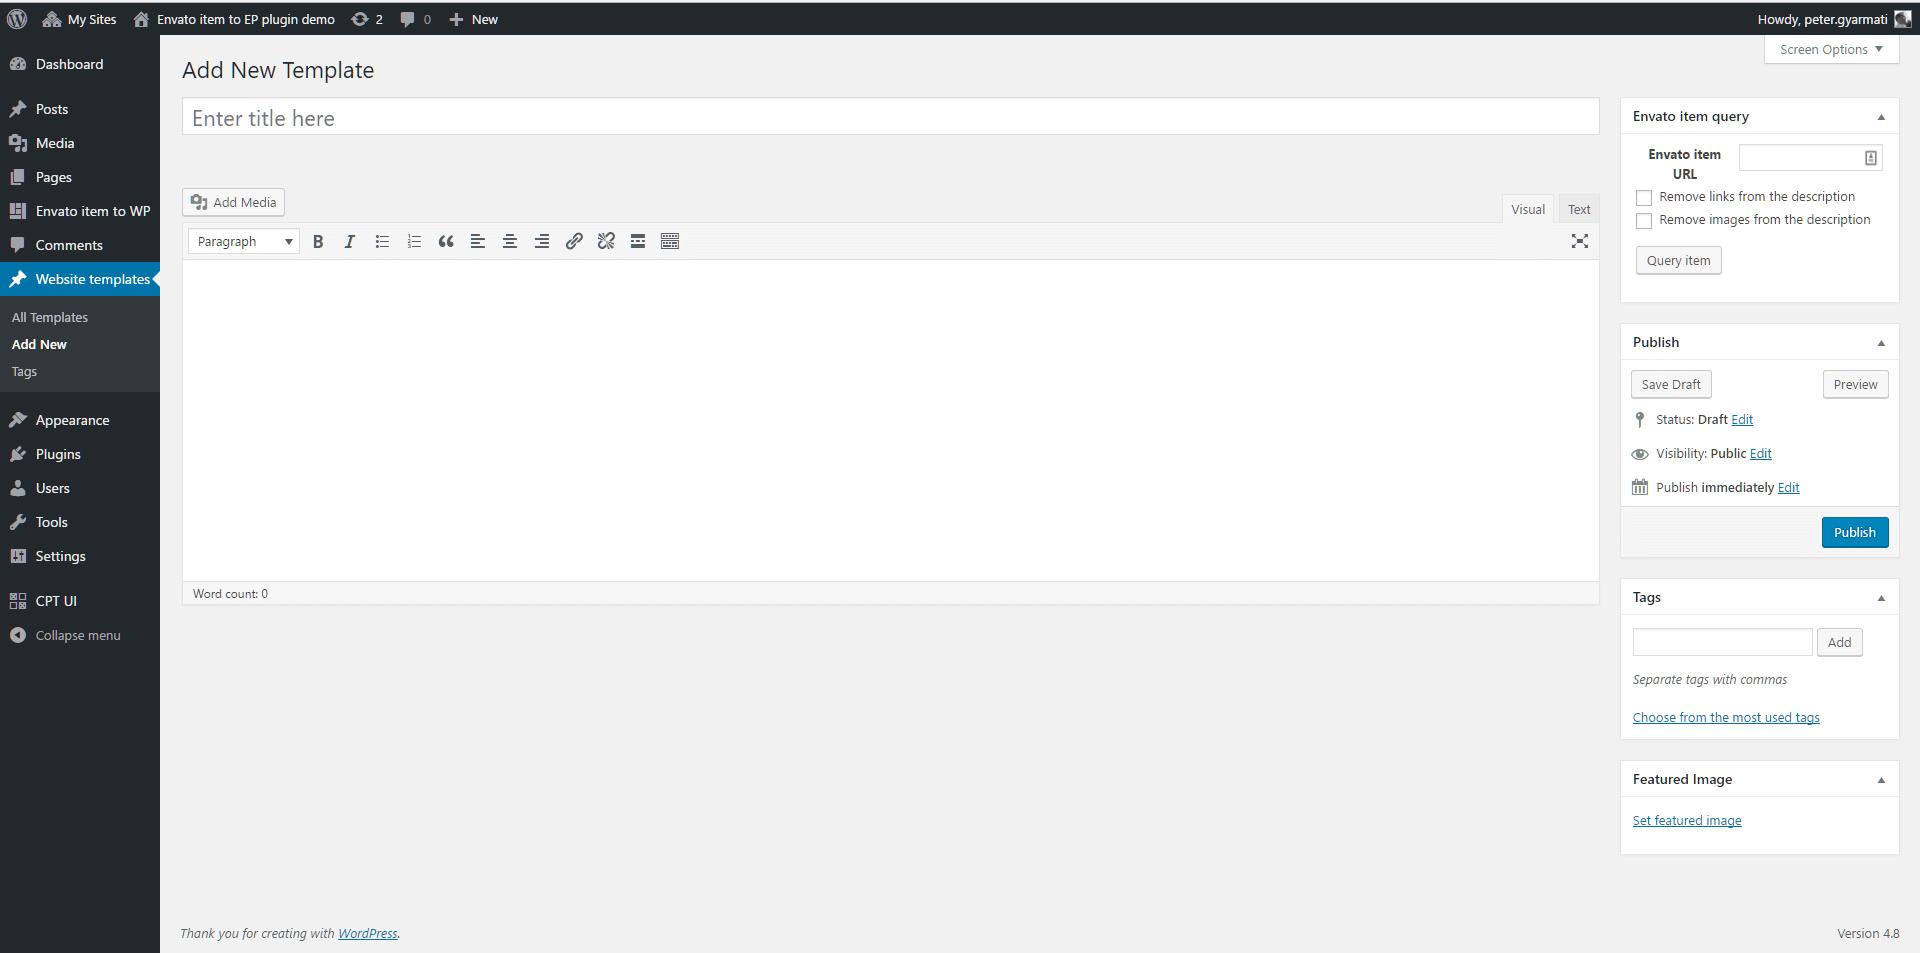 Add new envato item in custom post